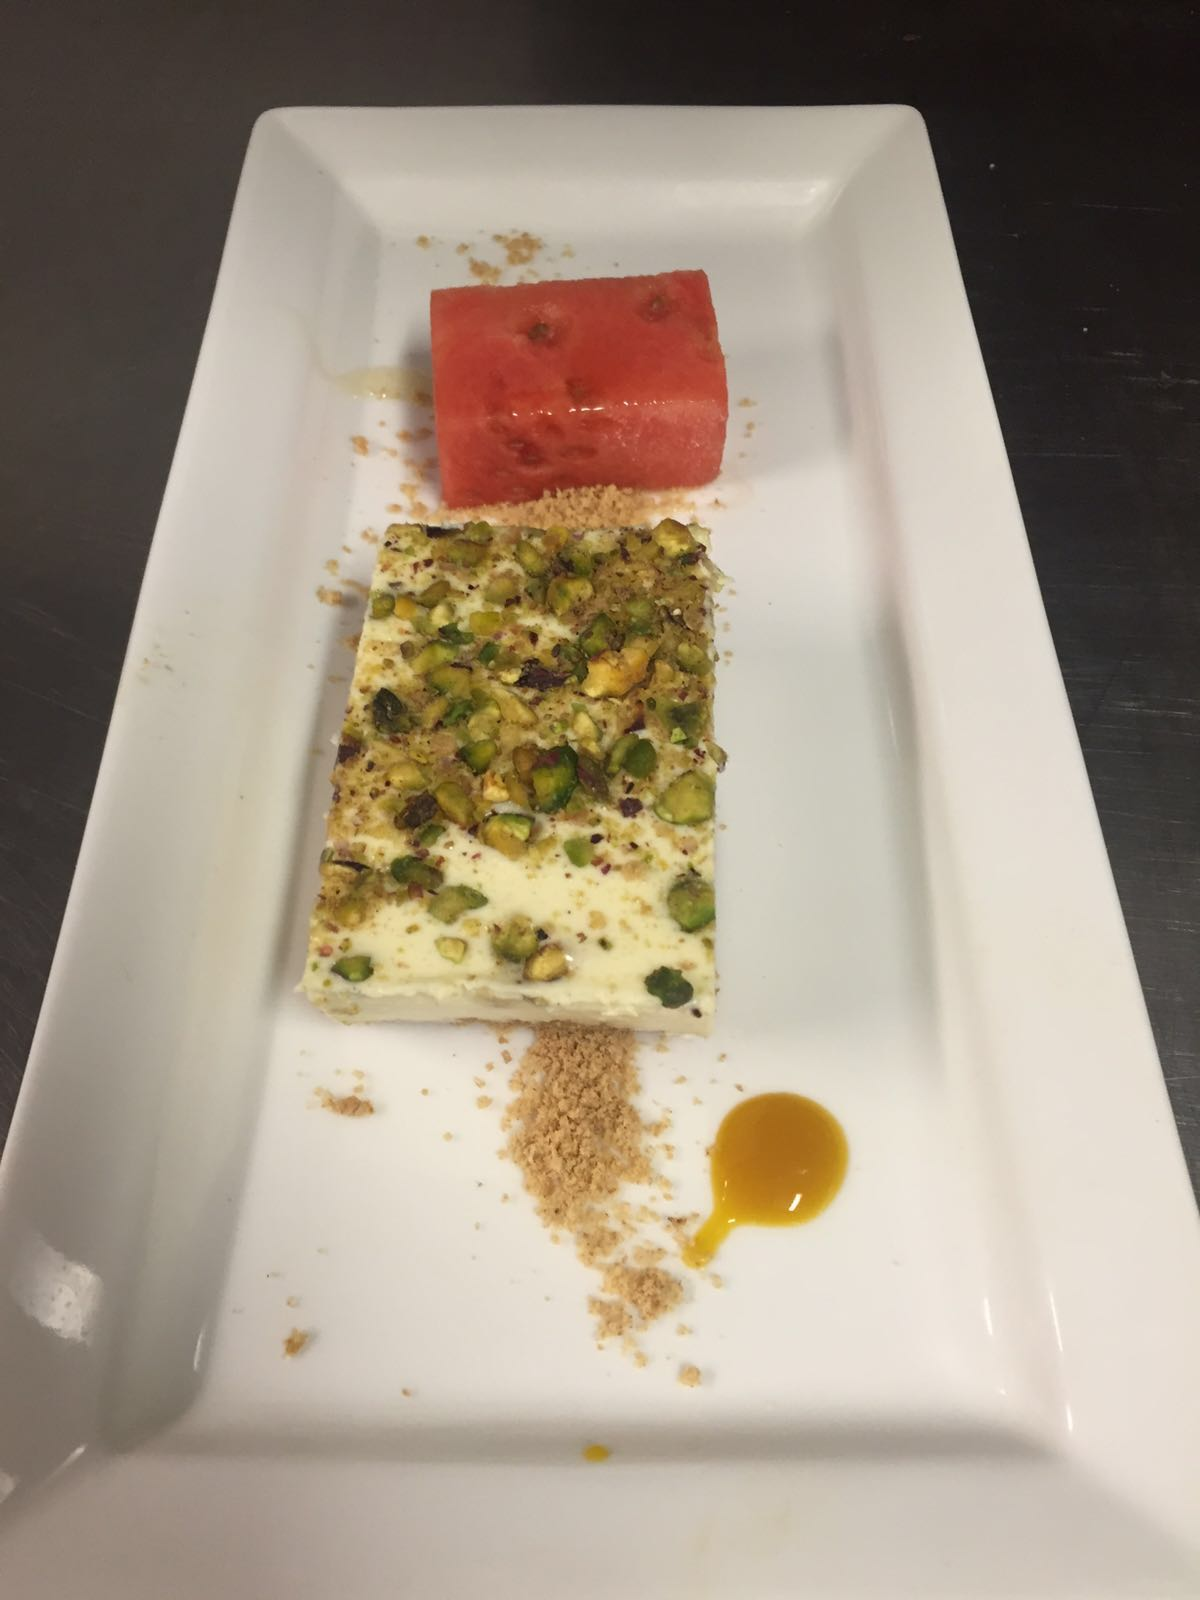 pistachio & honey cheesecake with watermelon